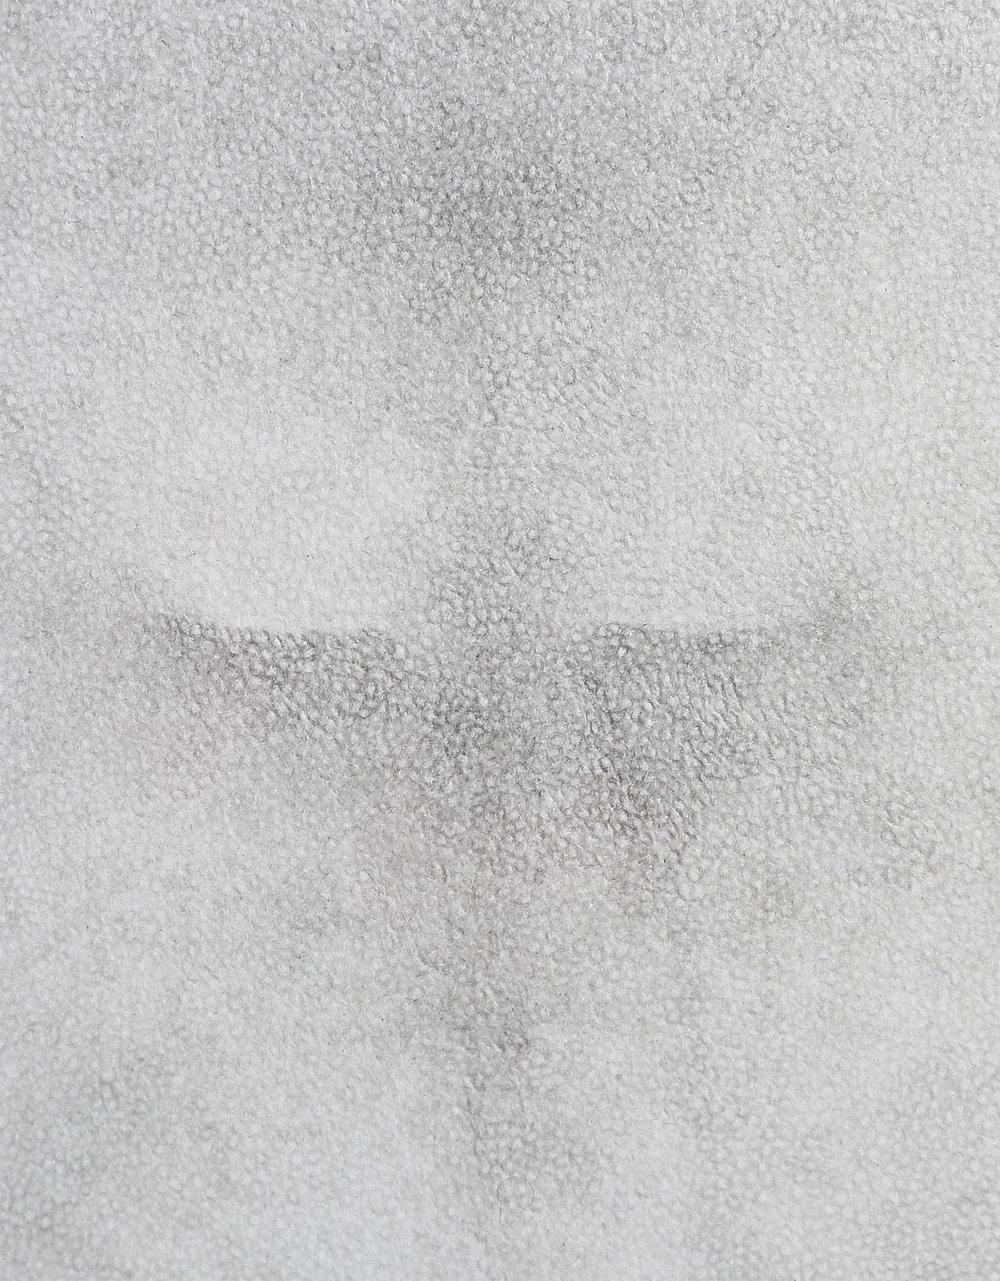 Negative-Space-detail-i-72dpi-1500px-web.jpg